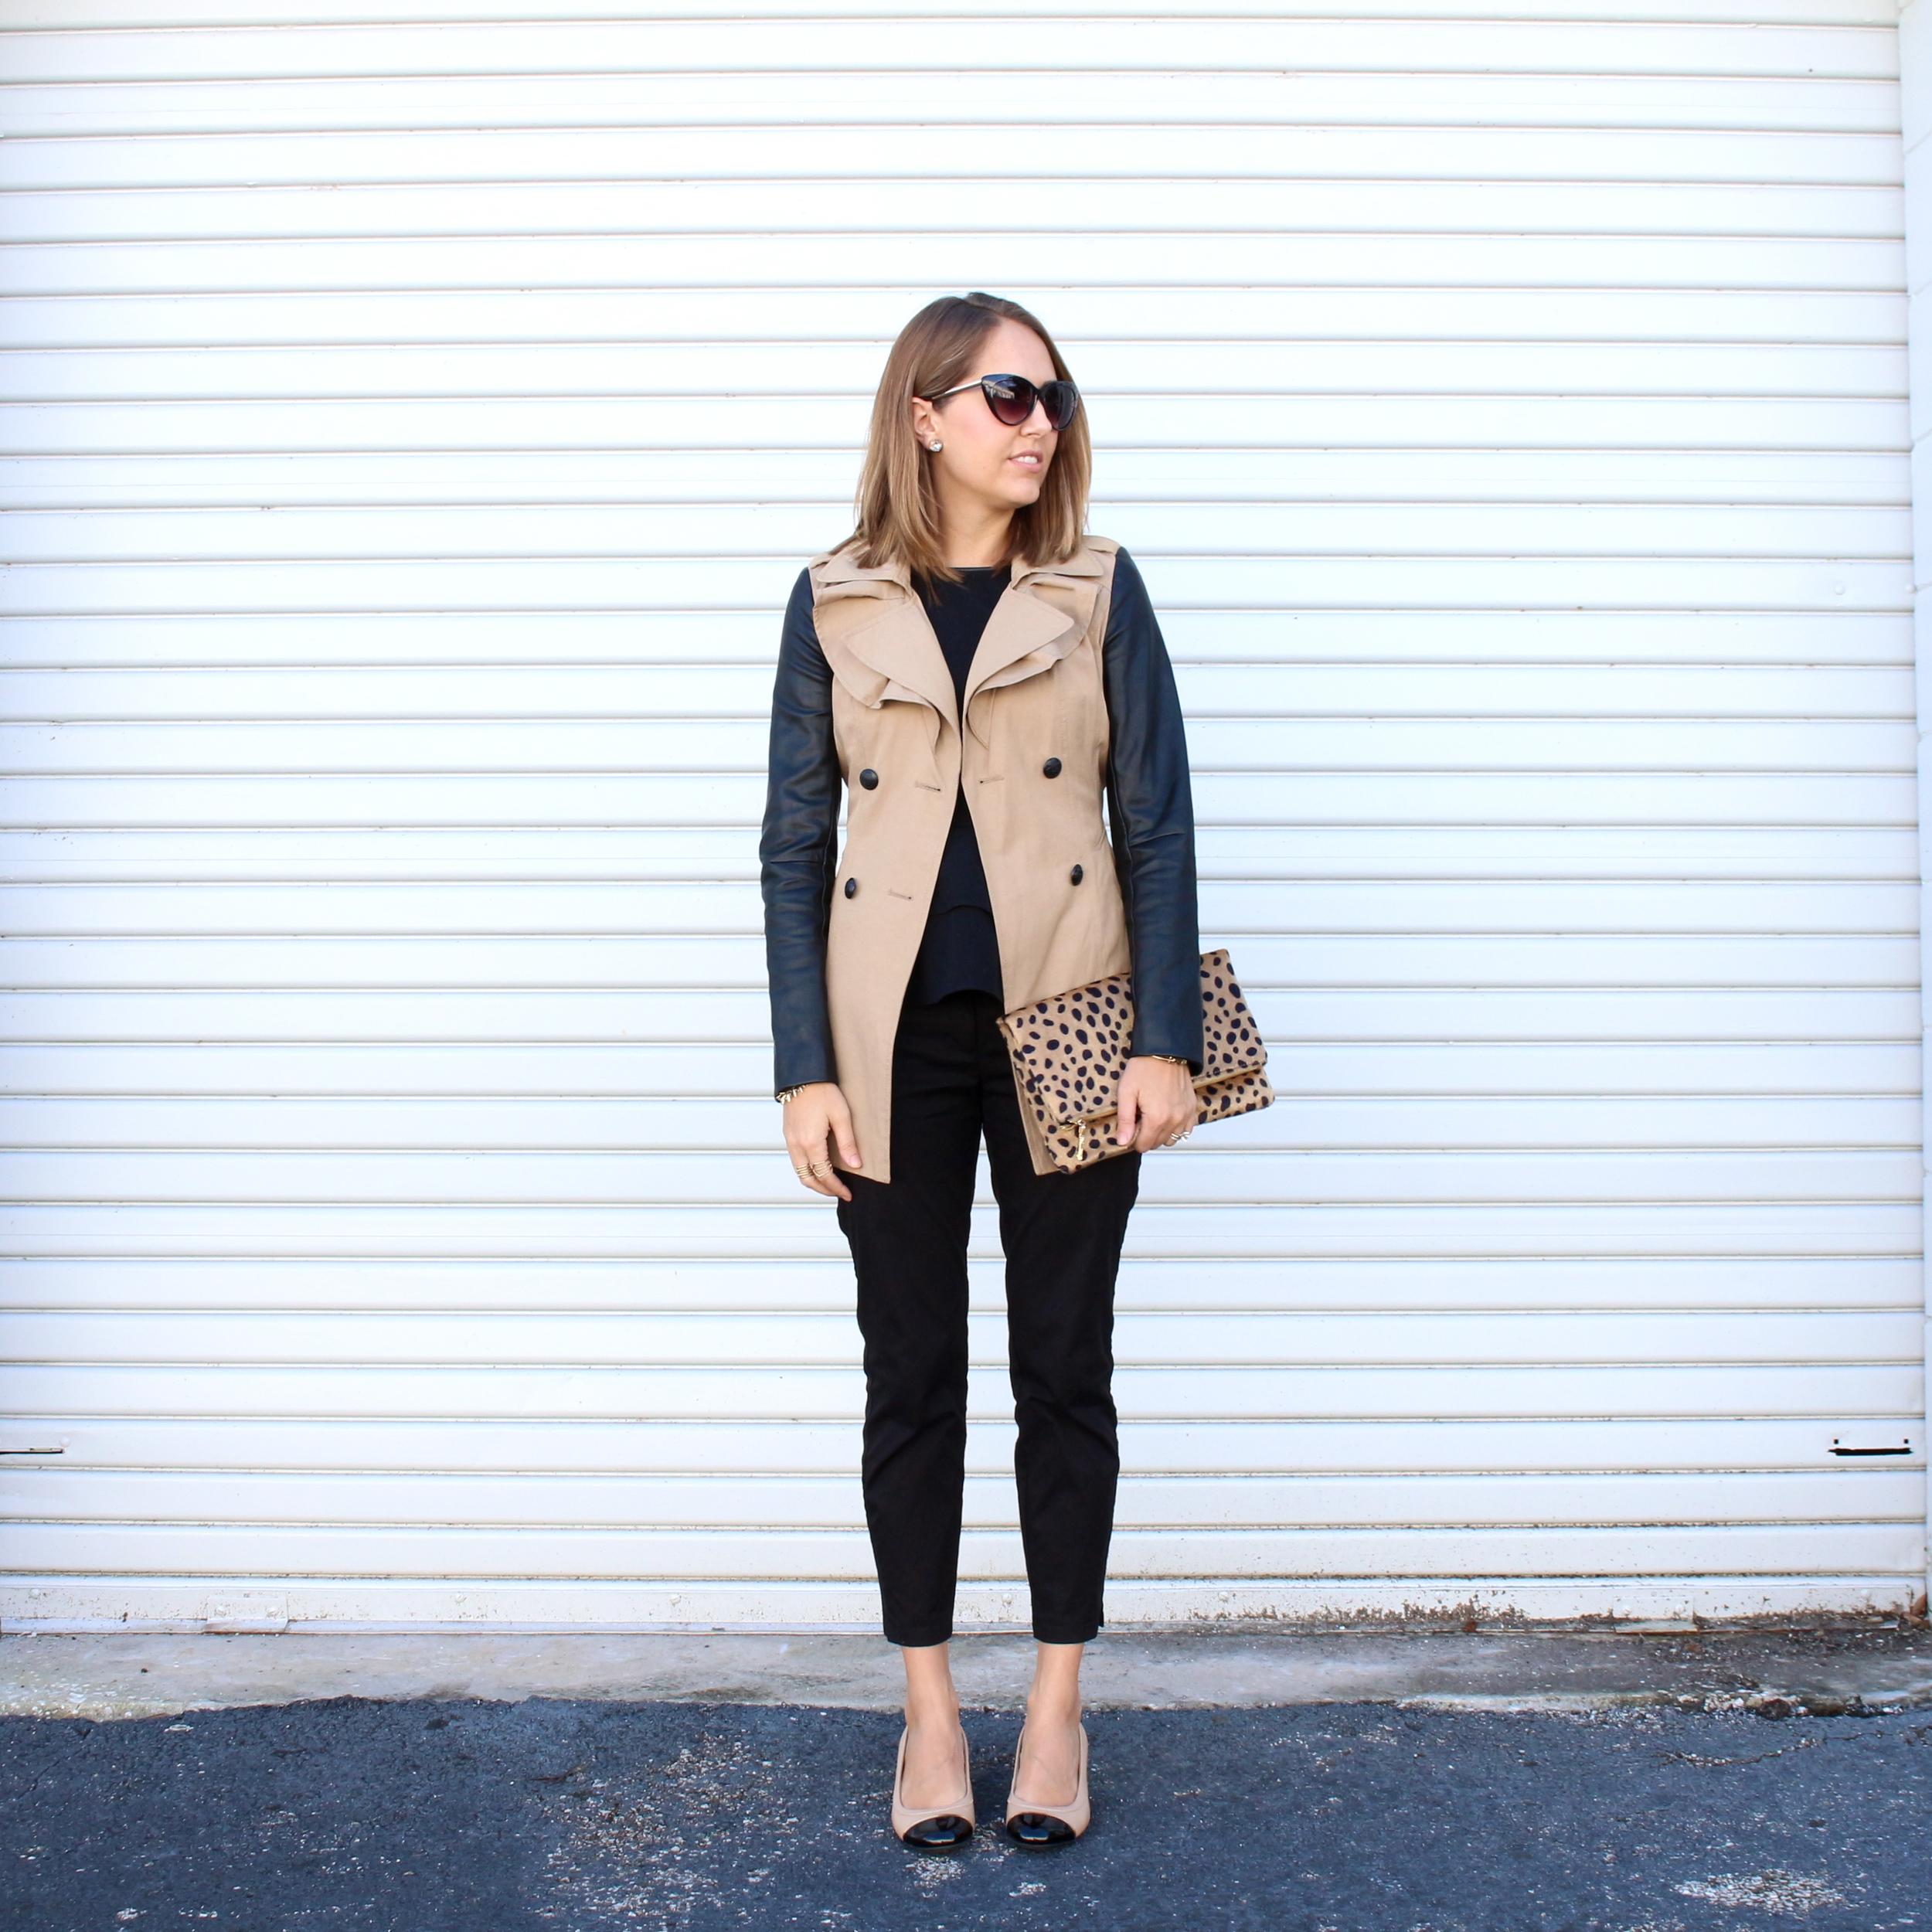 Leather sleeve trench, black dress pants, leopard clutch, cap toe flats